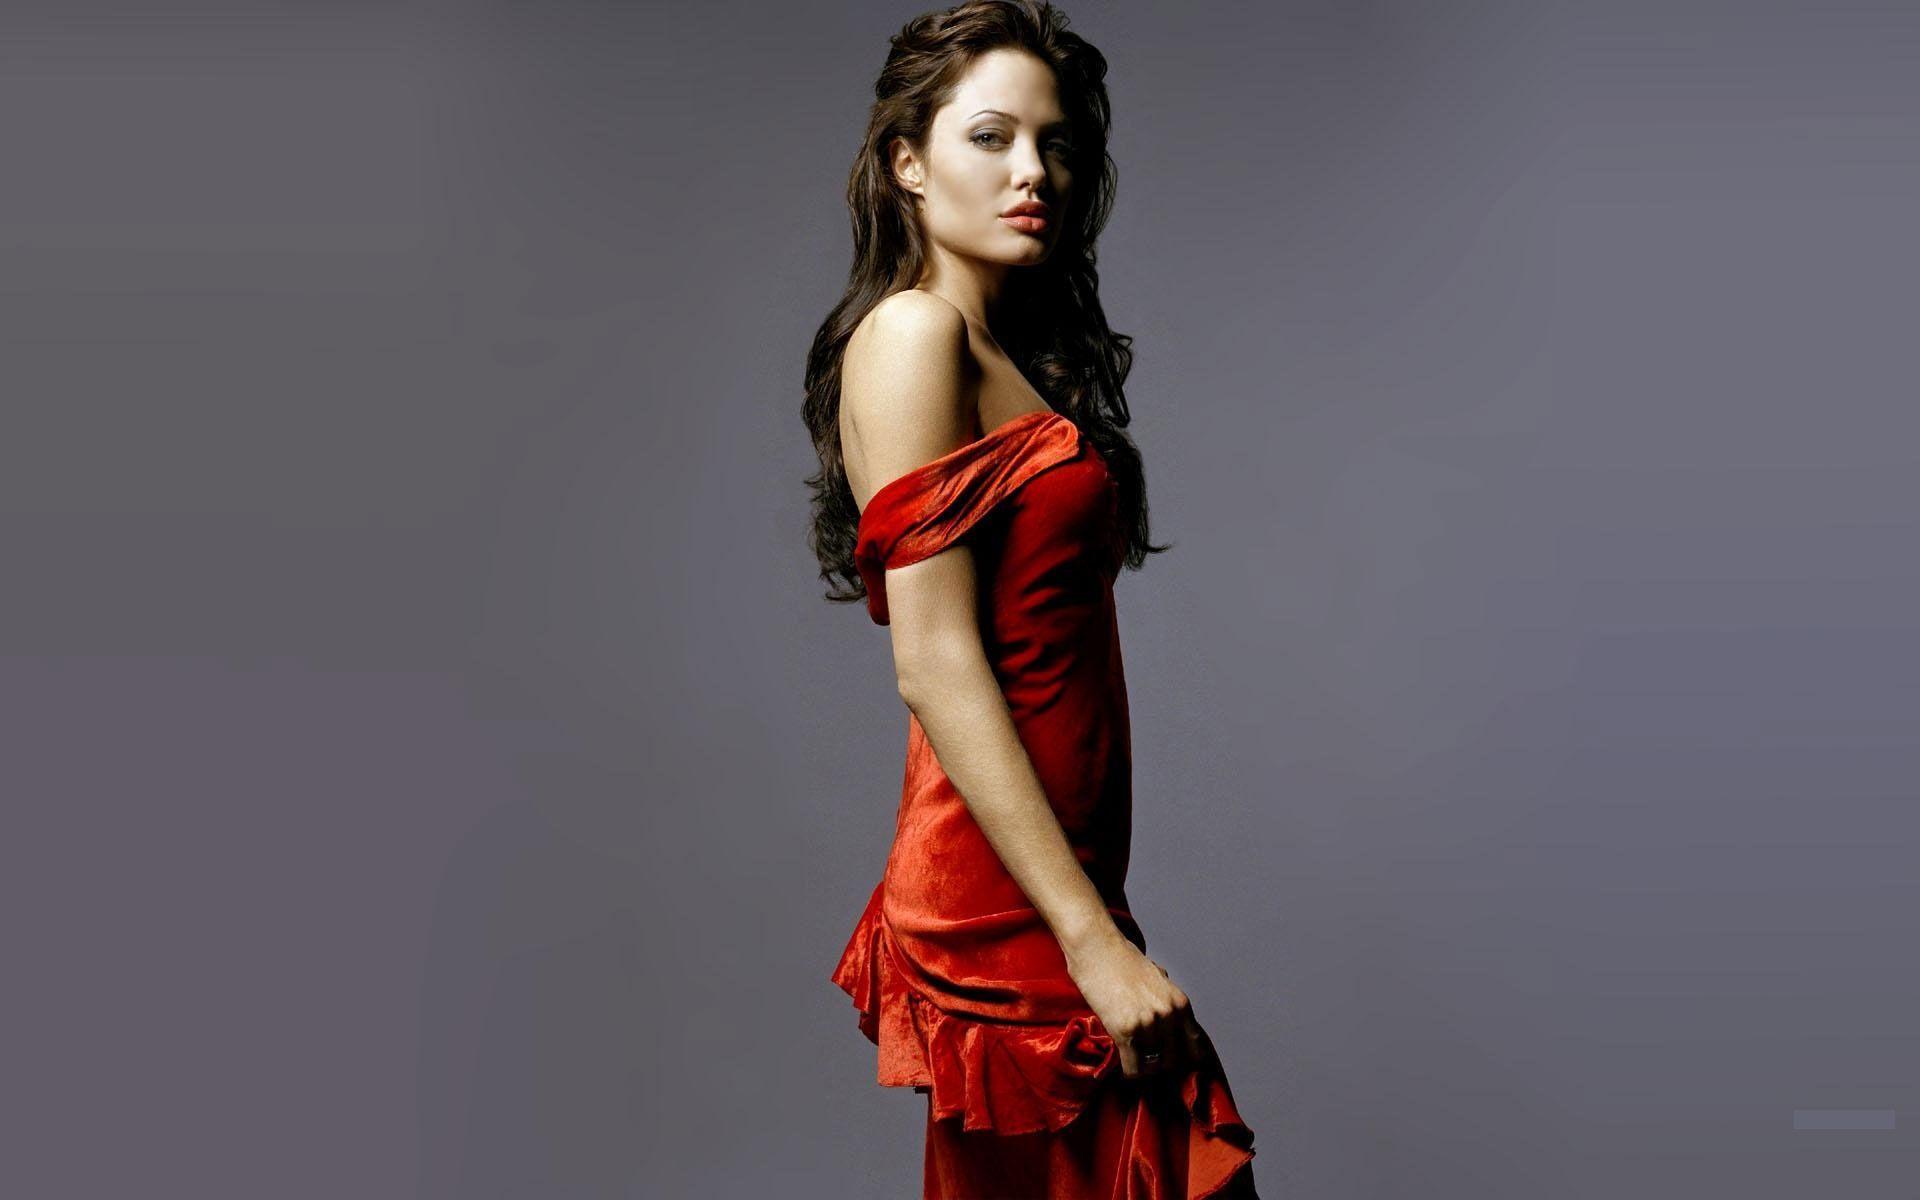 Angelina Jolie Hot Stills angelina jolie hot stills | hollywood actress | angelina